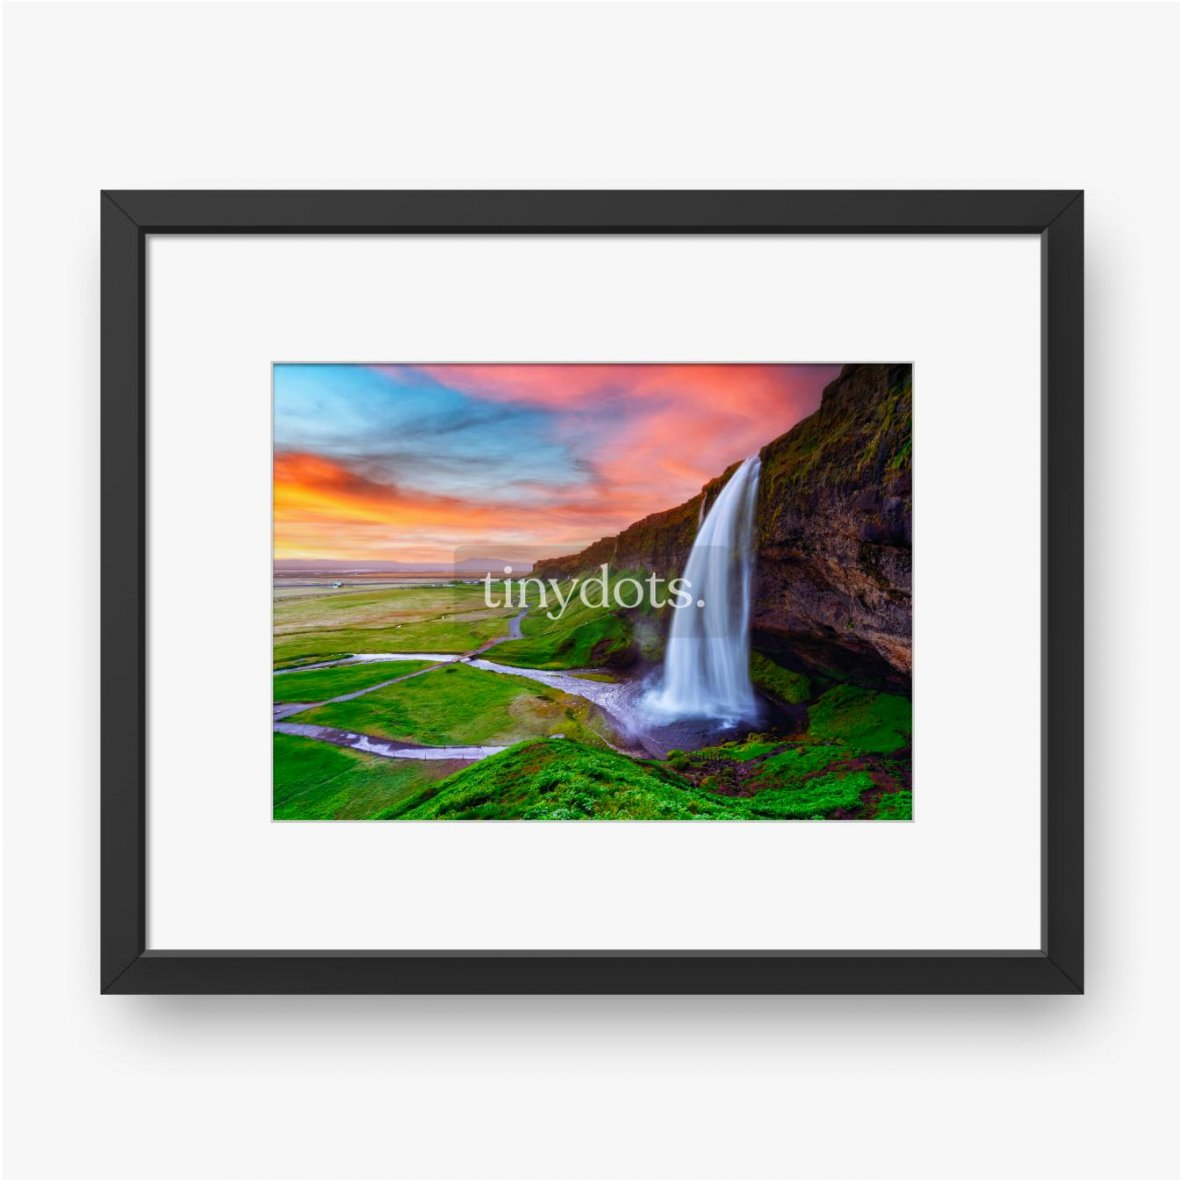 Gerahmte Poster Sonnenaufgang auf Seljalandfoss Wasserfall auf Seljalandsa Fluss, Island, Europa. Erstaunliche Aussicht von innen. Landschaftsfo